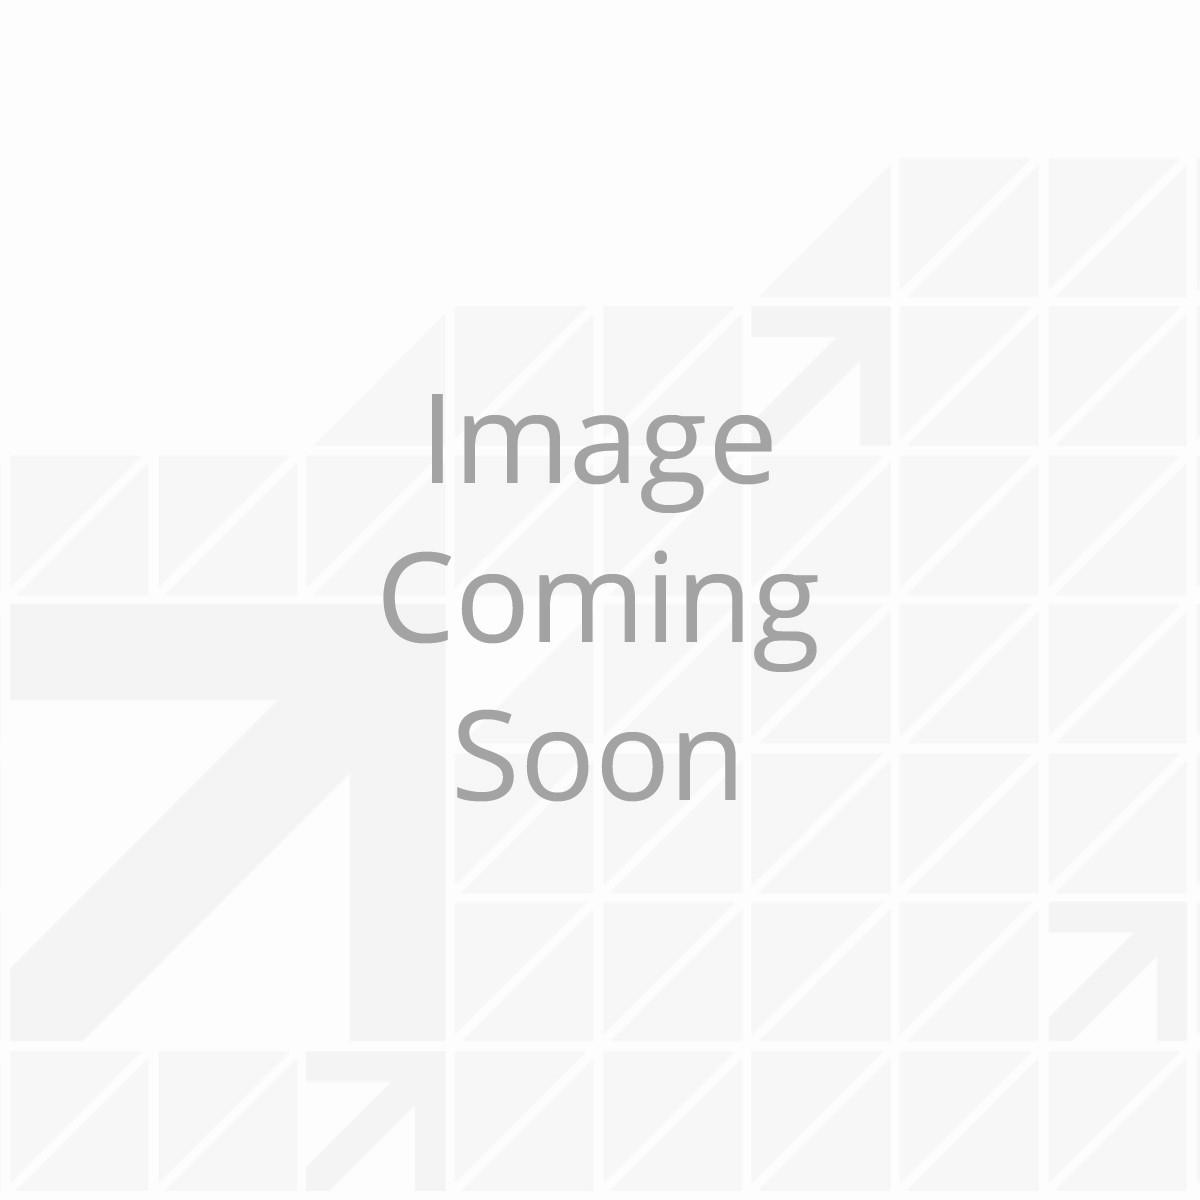 371010_Switch-Kit_001